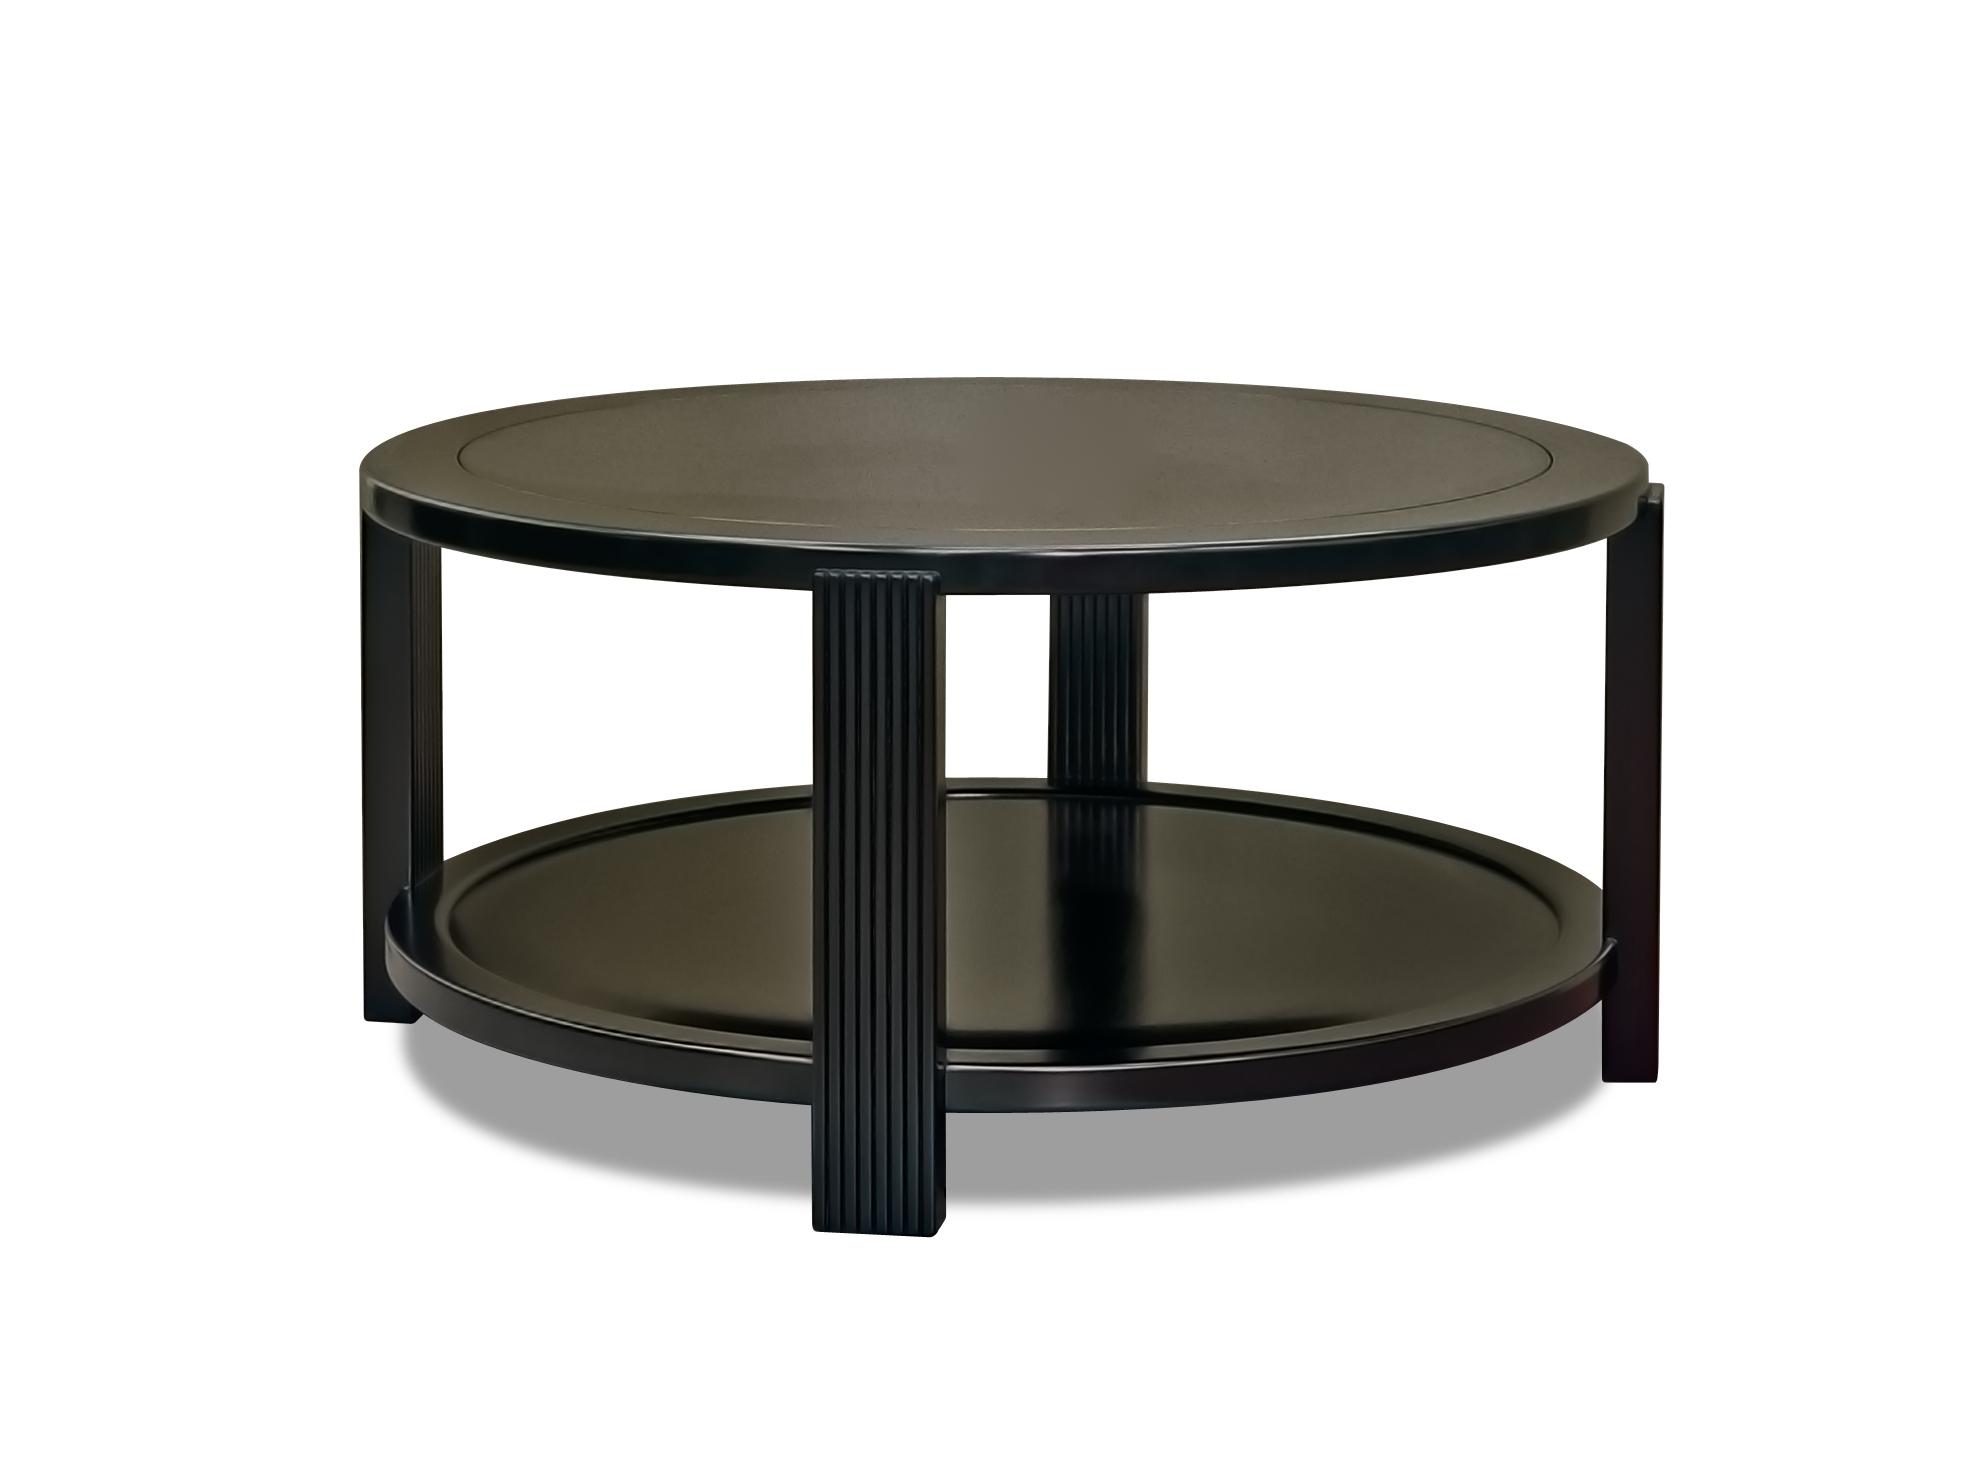 ....Art Deco style furniture : Round Coffee Table..艺术装饰风格家具: 圆咖啡台....